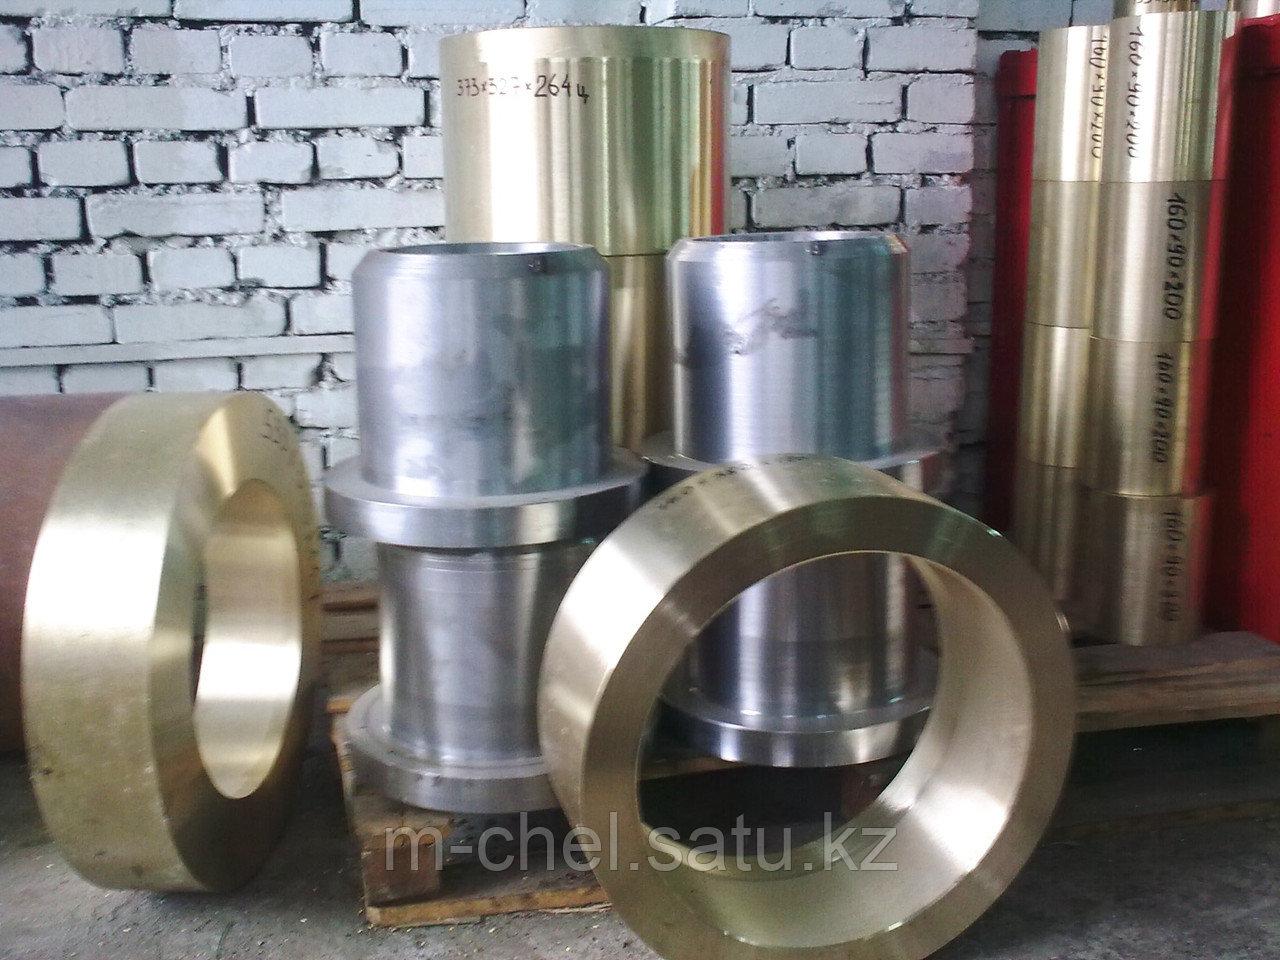 Втулка бронзовая 65 мм броцс5-5-5 центробежное литье ГОСТ